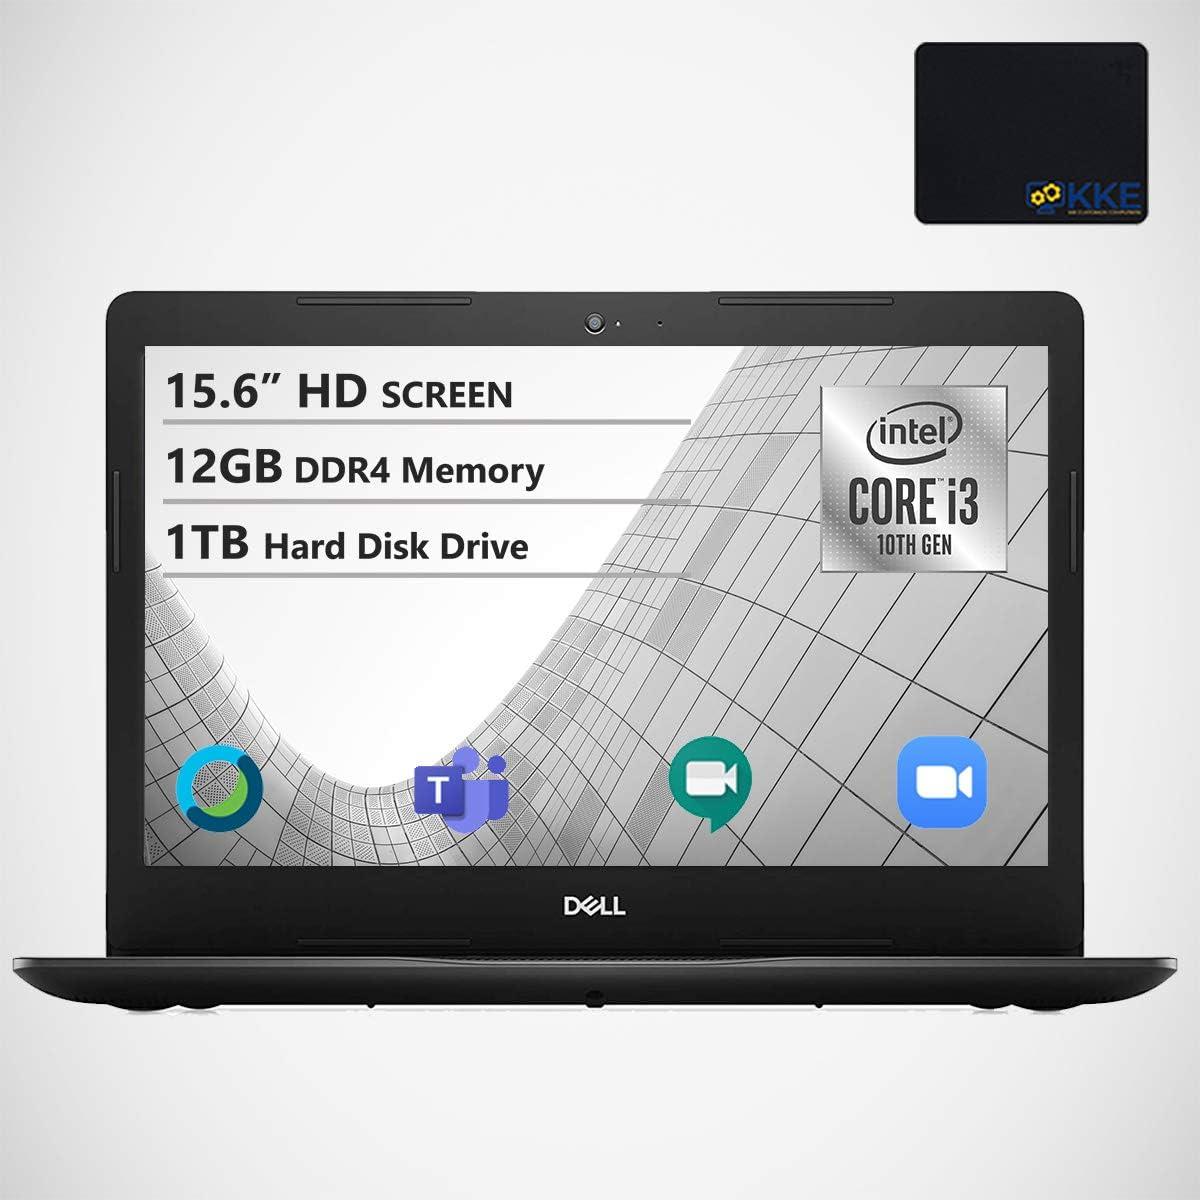 "Dell Inspiron 15.6"" HD Laptop, Intel Core i3-1005G1 Processor, 12GB DDR4 Memory, 1TB HDD, WiFi, Webcam, Online Class Ready, HDMI, Bluetooth, KKE Mousepad, Win10 Home, Black"